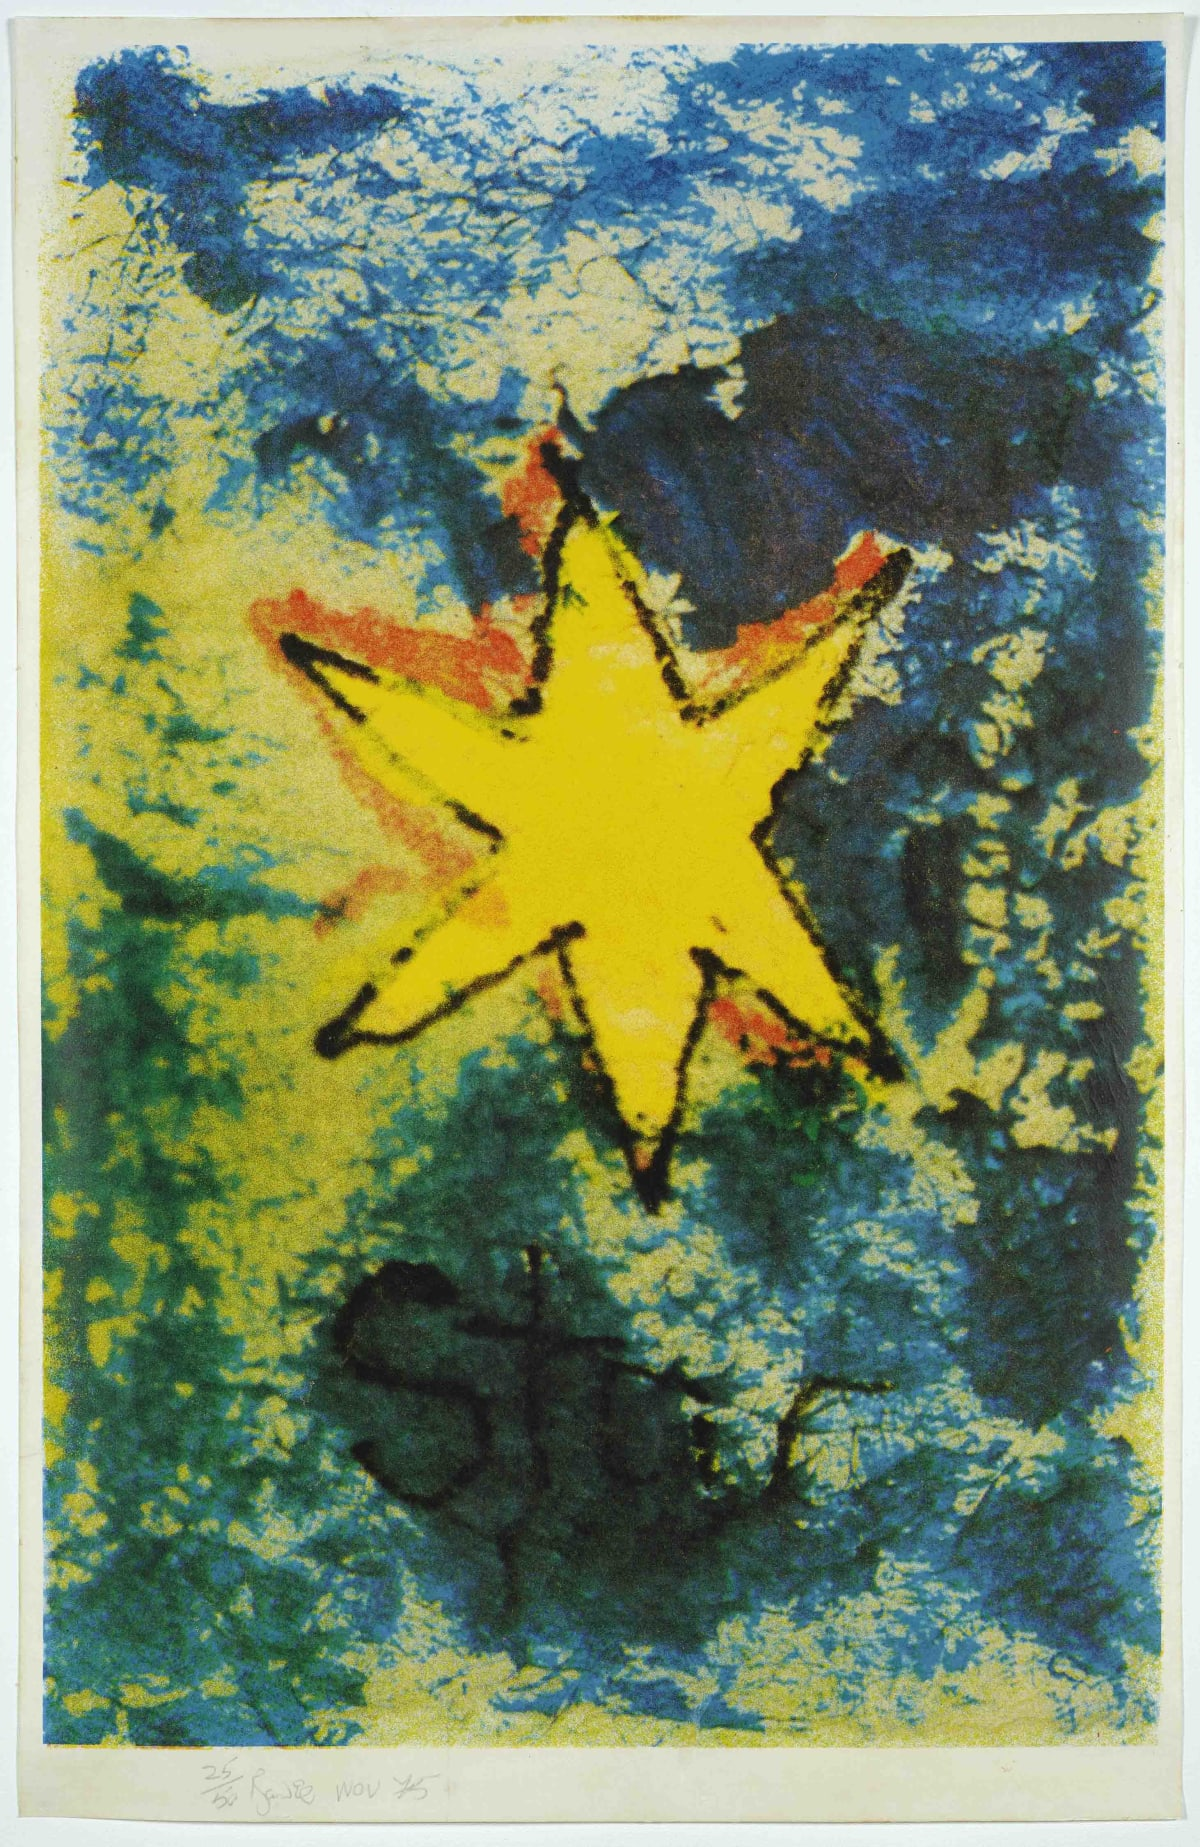 David Bowie, Star, 1975